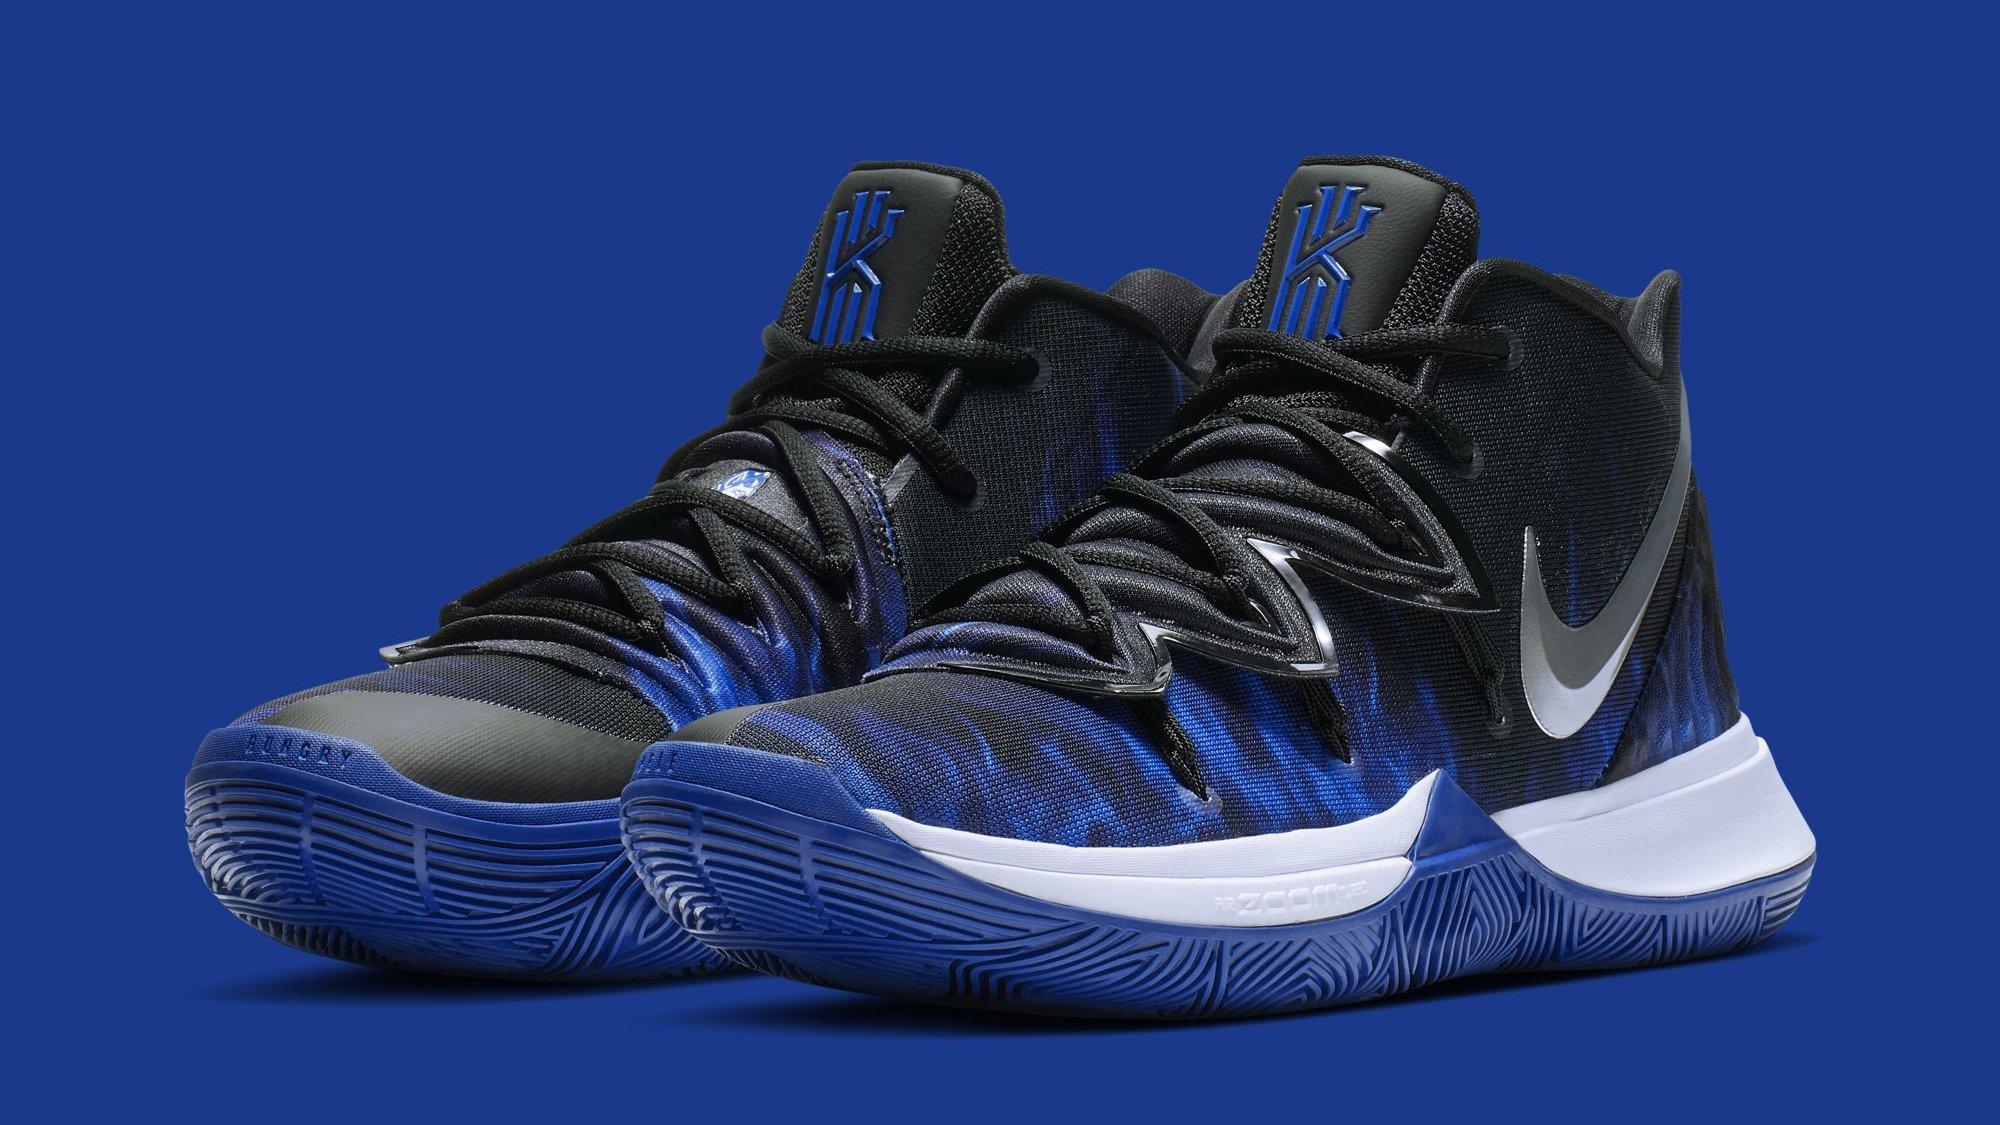 077c149957ae Nike Kyrie 5  Duke  CI0306-901 Release Date